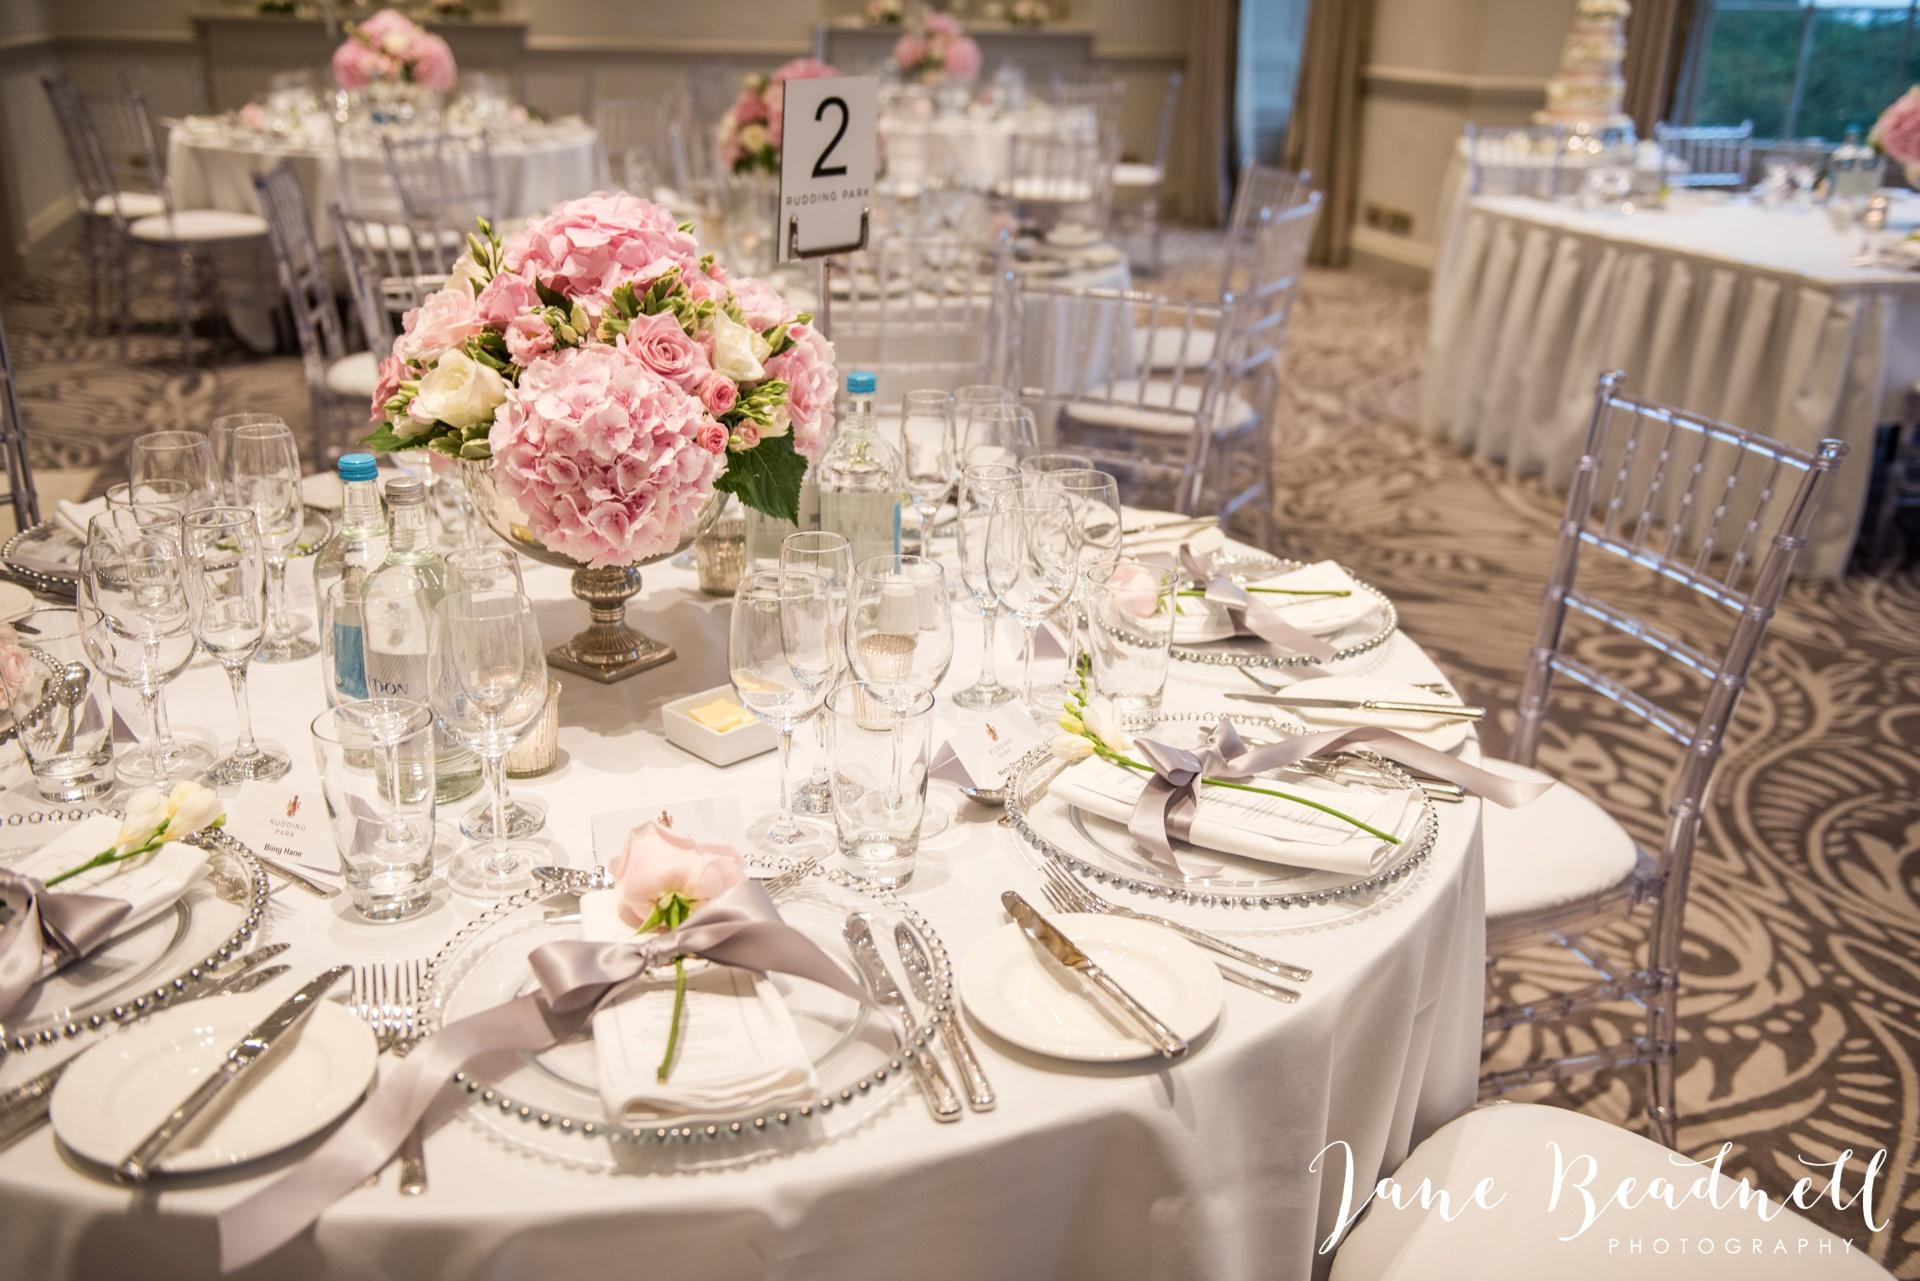 Jane Beadnell fine art wedding photographer Rudding Park Harrogate_0051